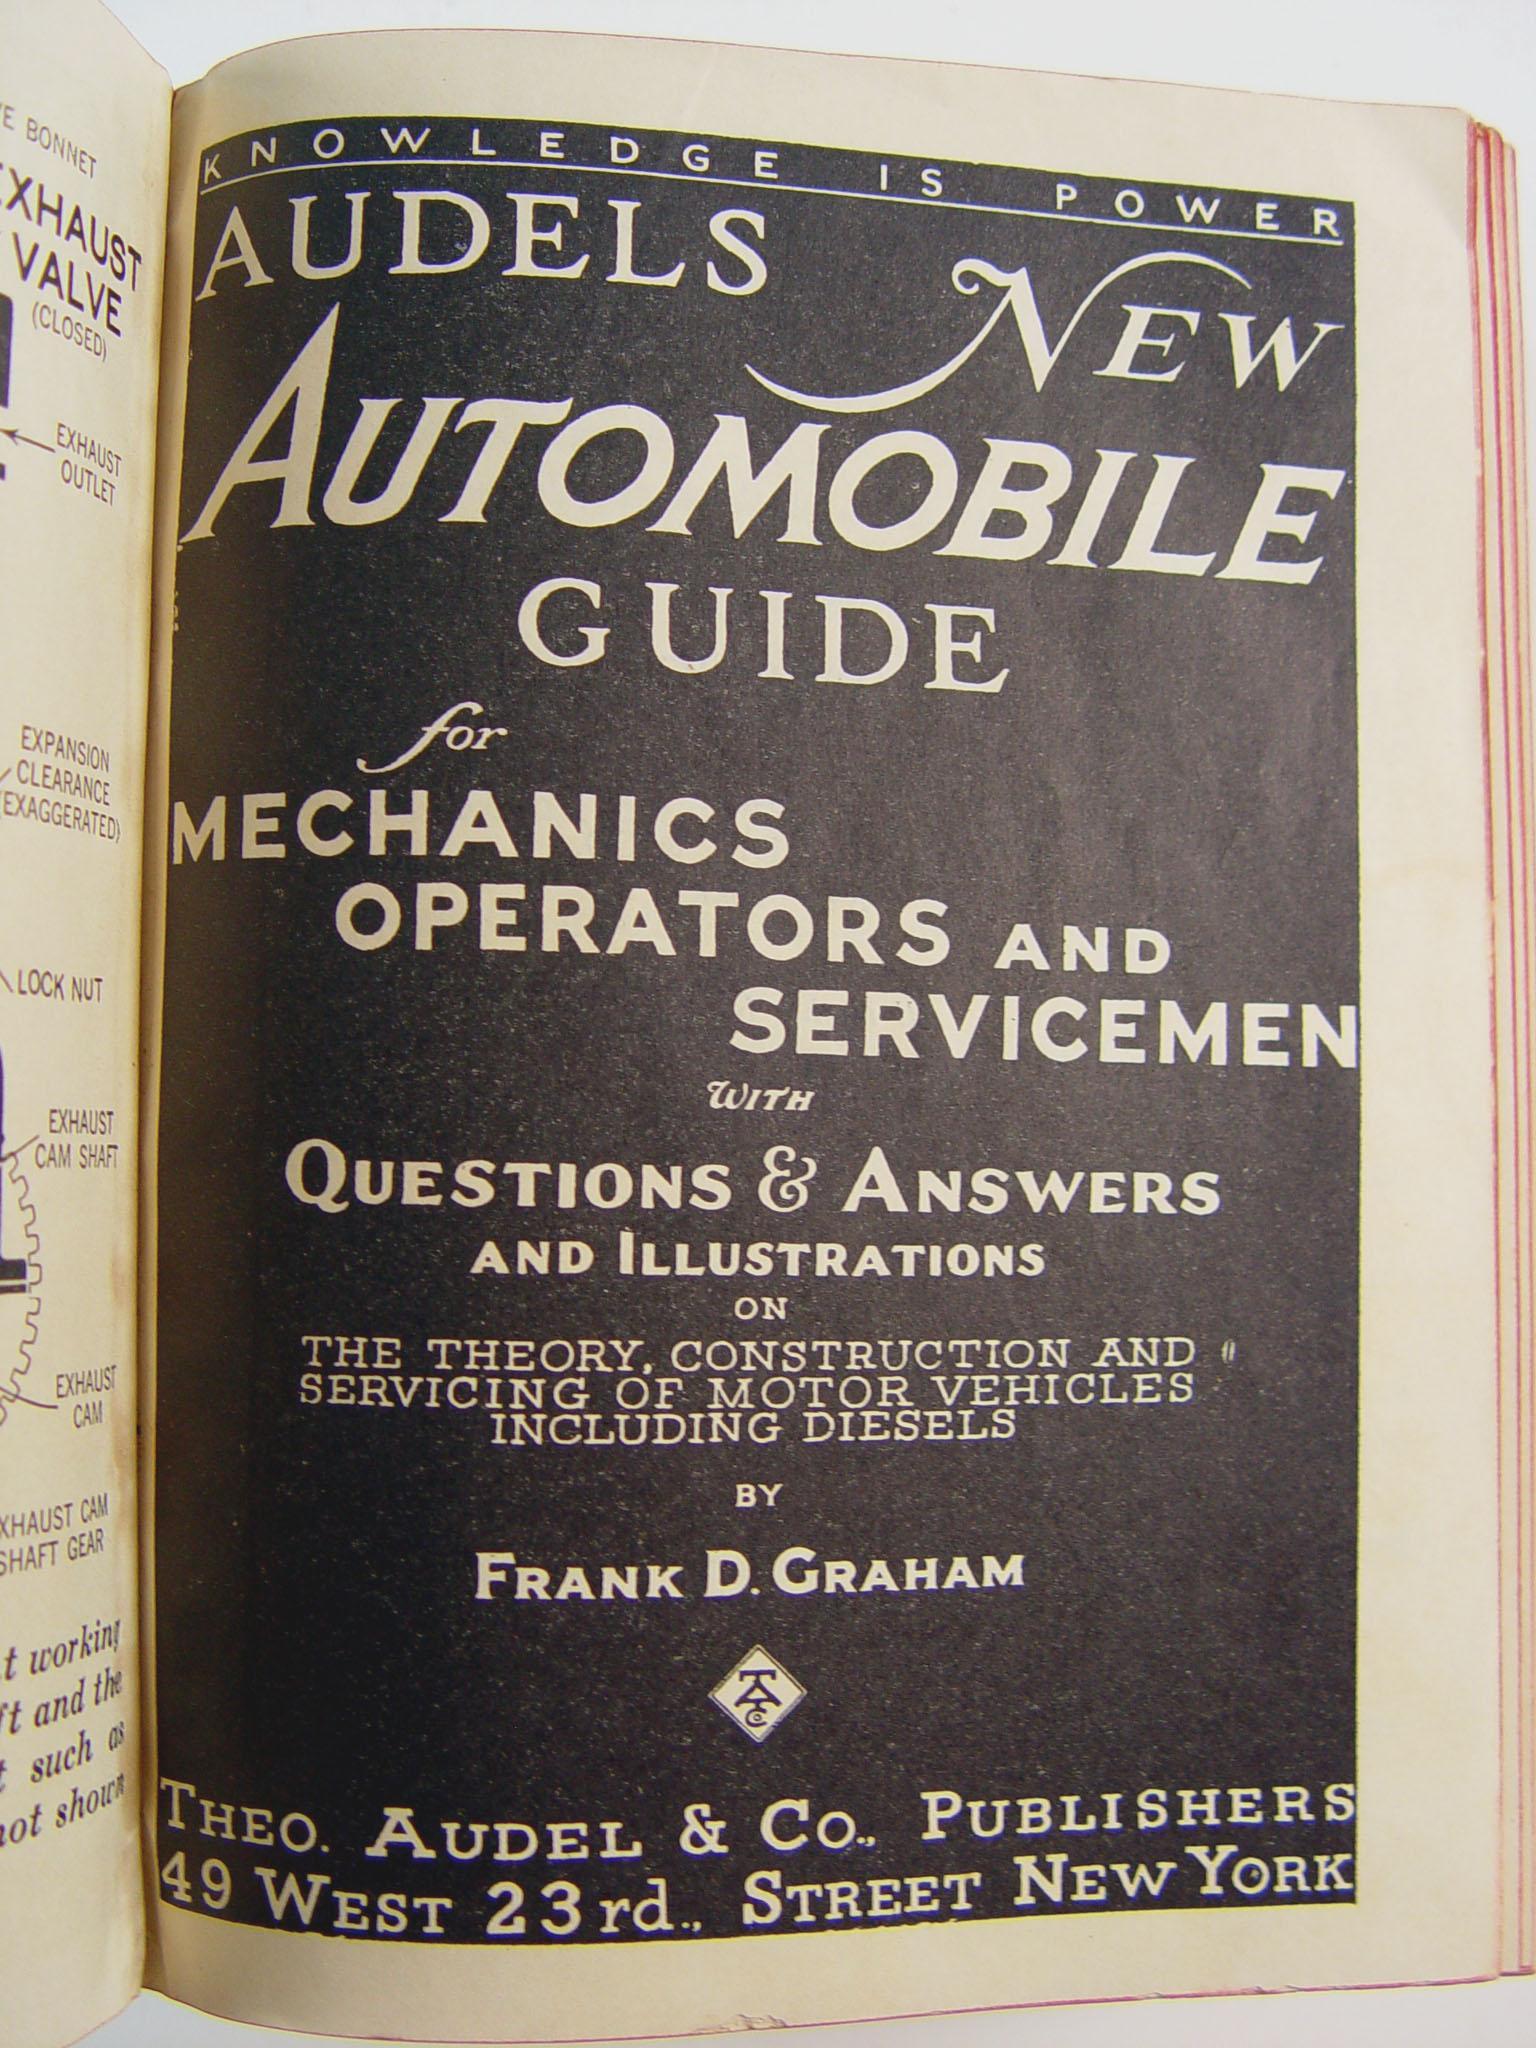 vintage 1940 audel s new automobile guide book chairish rh chairish com Audel Digital Watch Audel Digital Watch